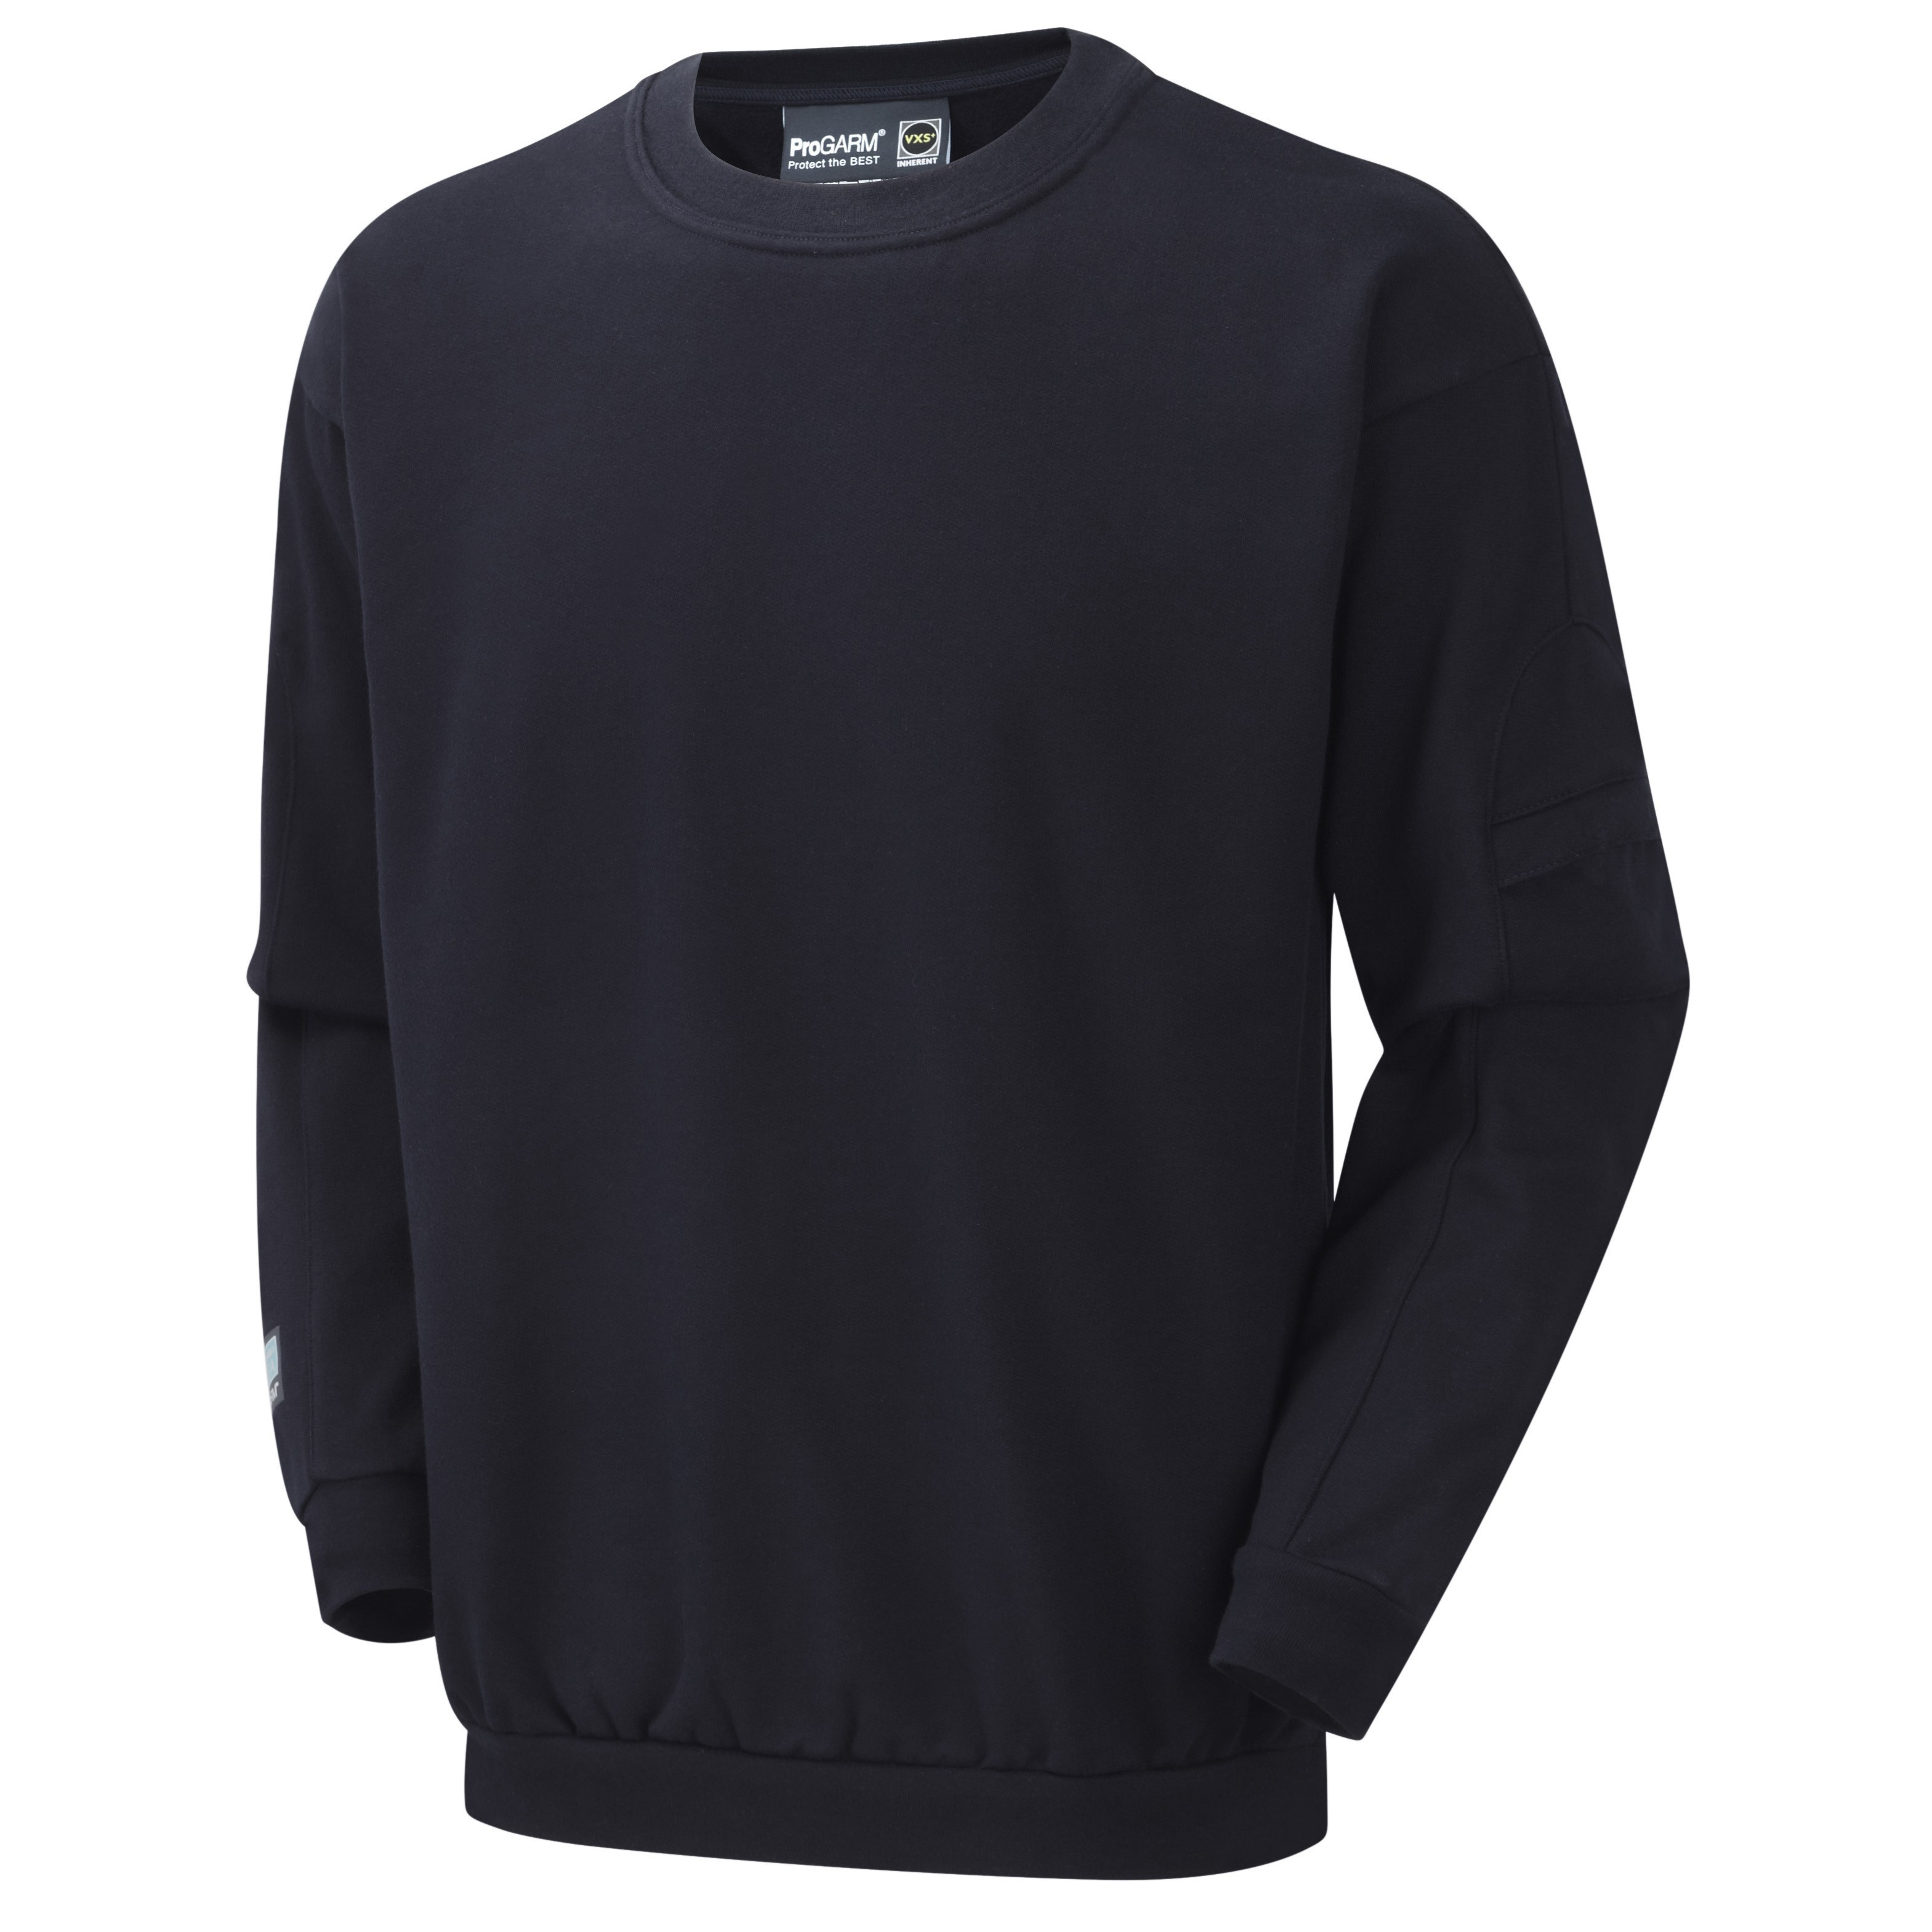 ProGARM 5630 Sweatshirt, Anti-Static, Class 1